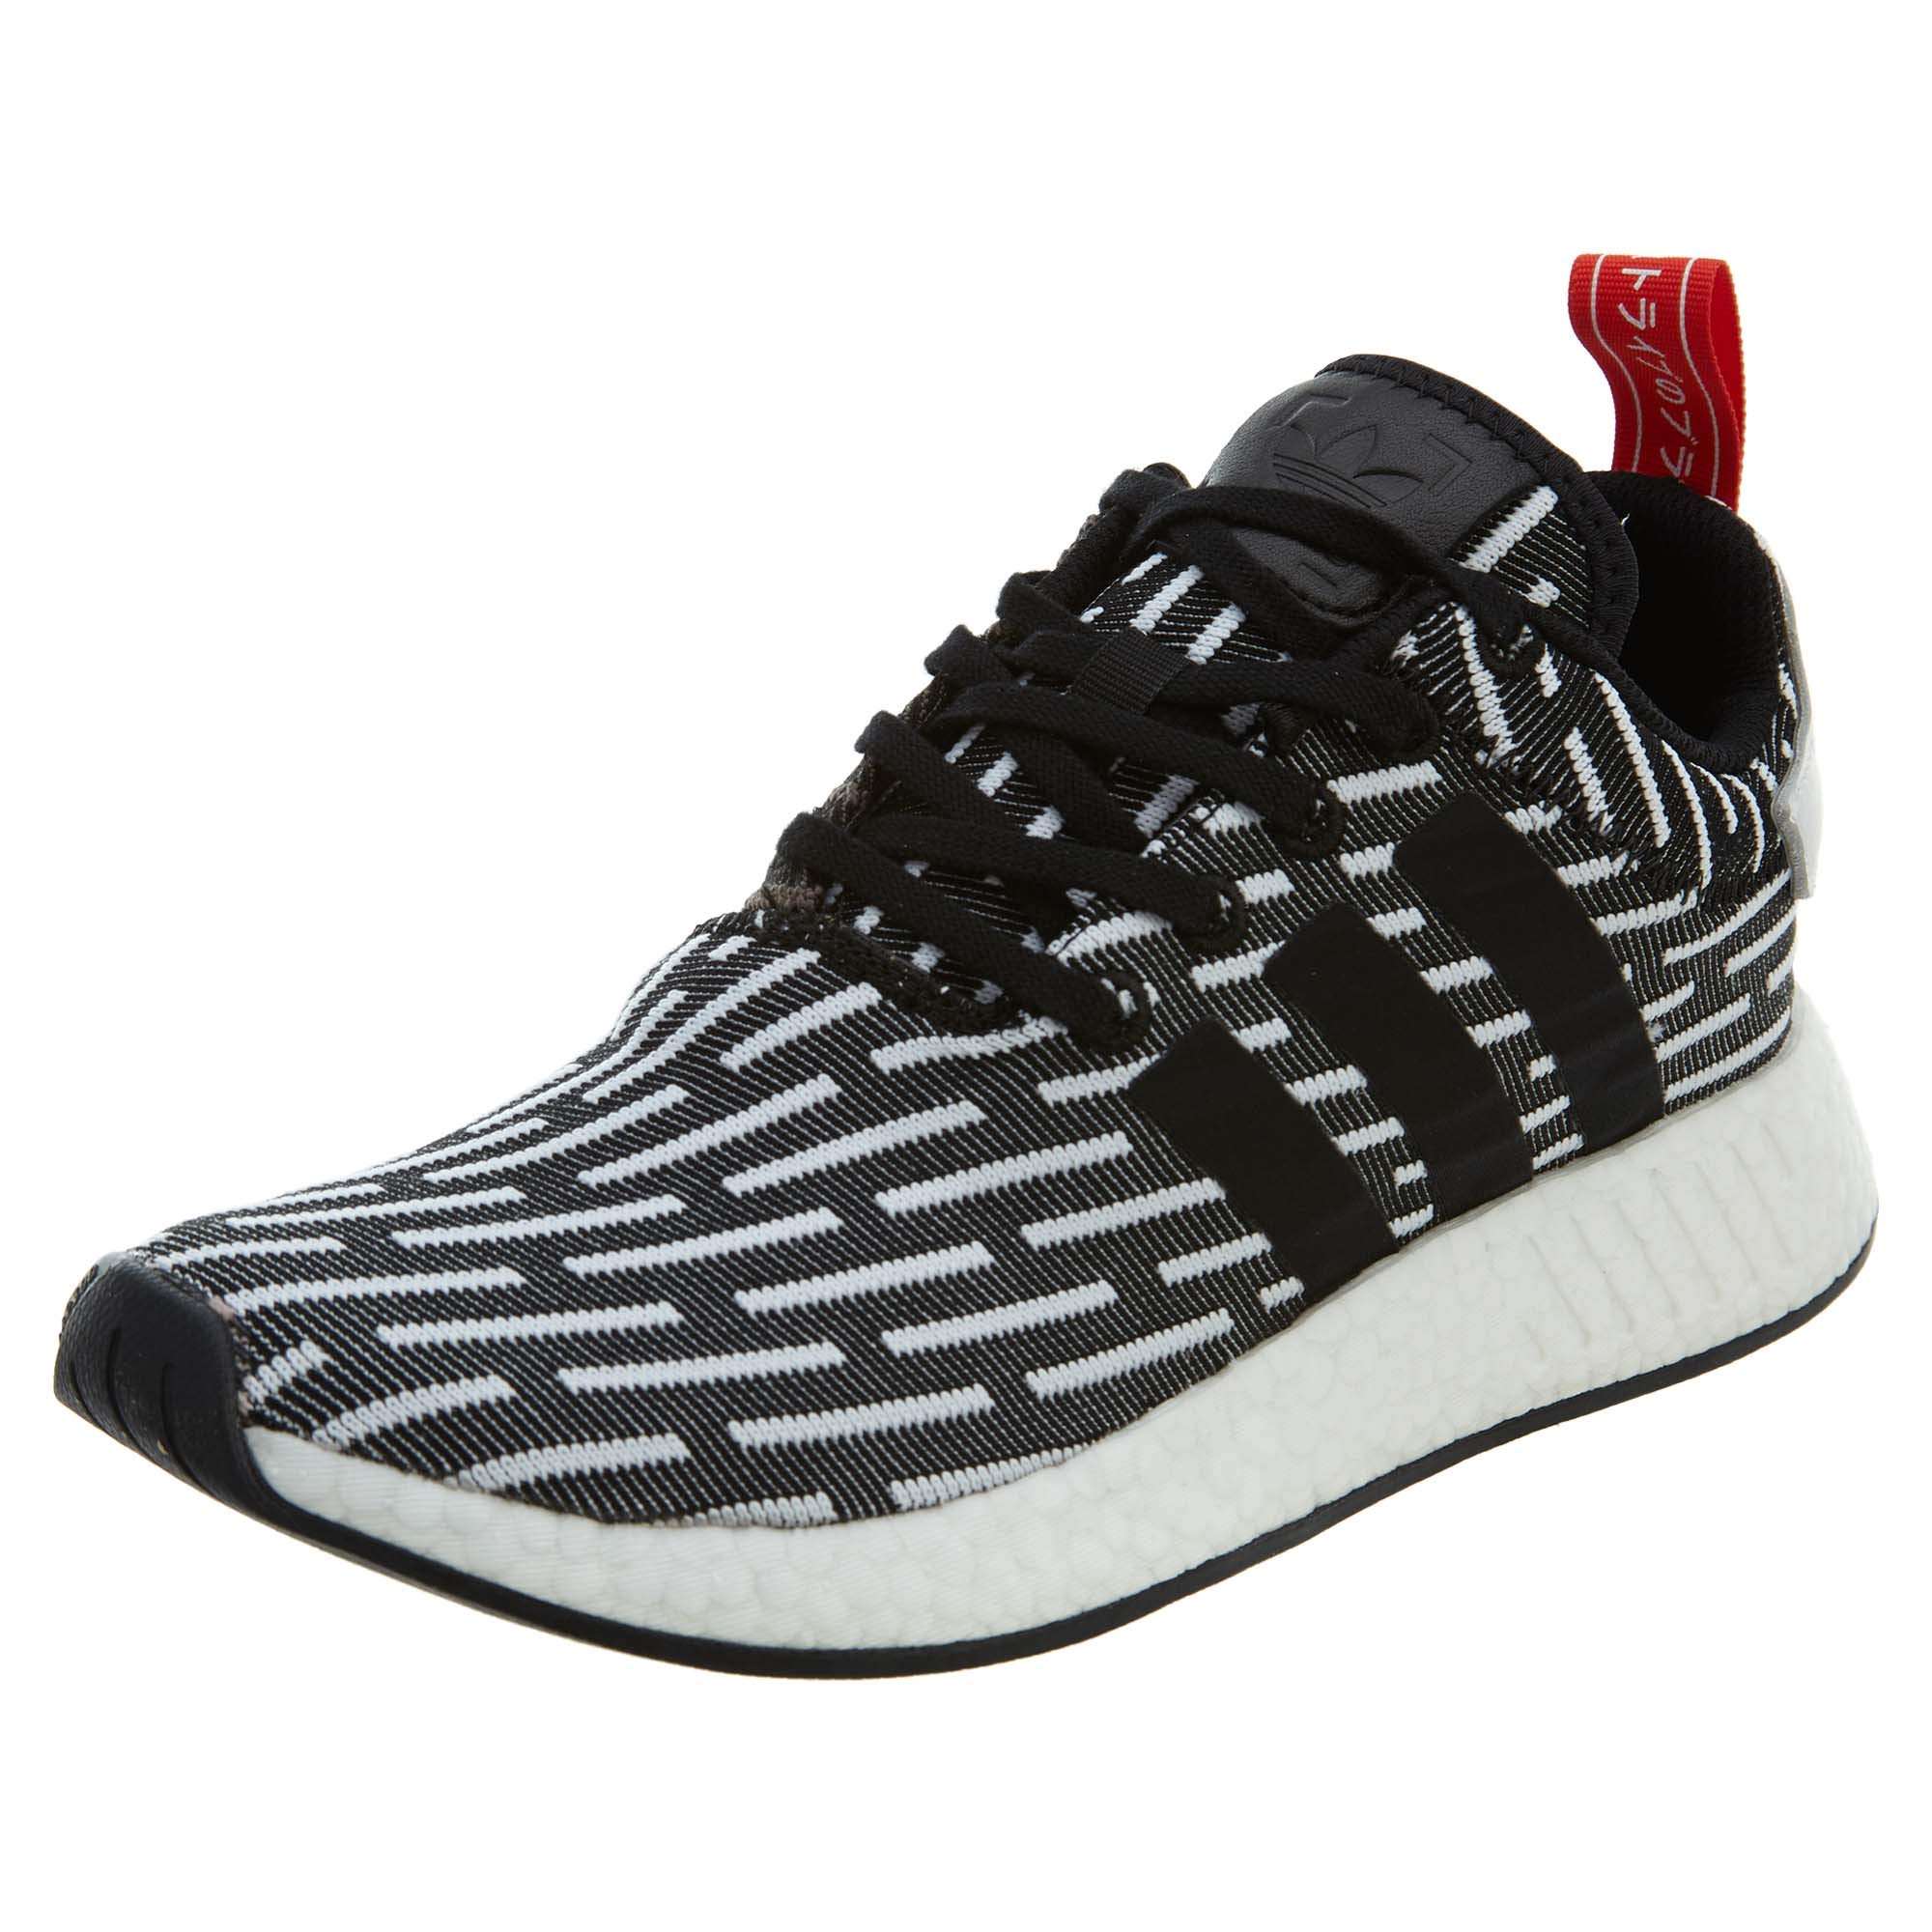 37e1a17743ab7 Galleon - Adidas NMD R2 Pk Mens Style  BB2951-Blk Wht Size  8 Black White